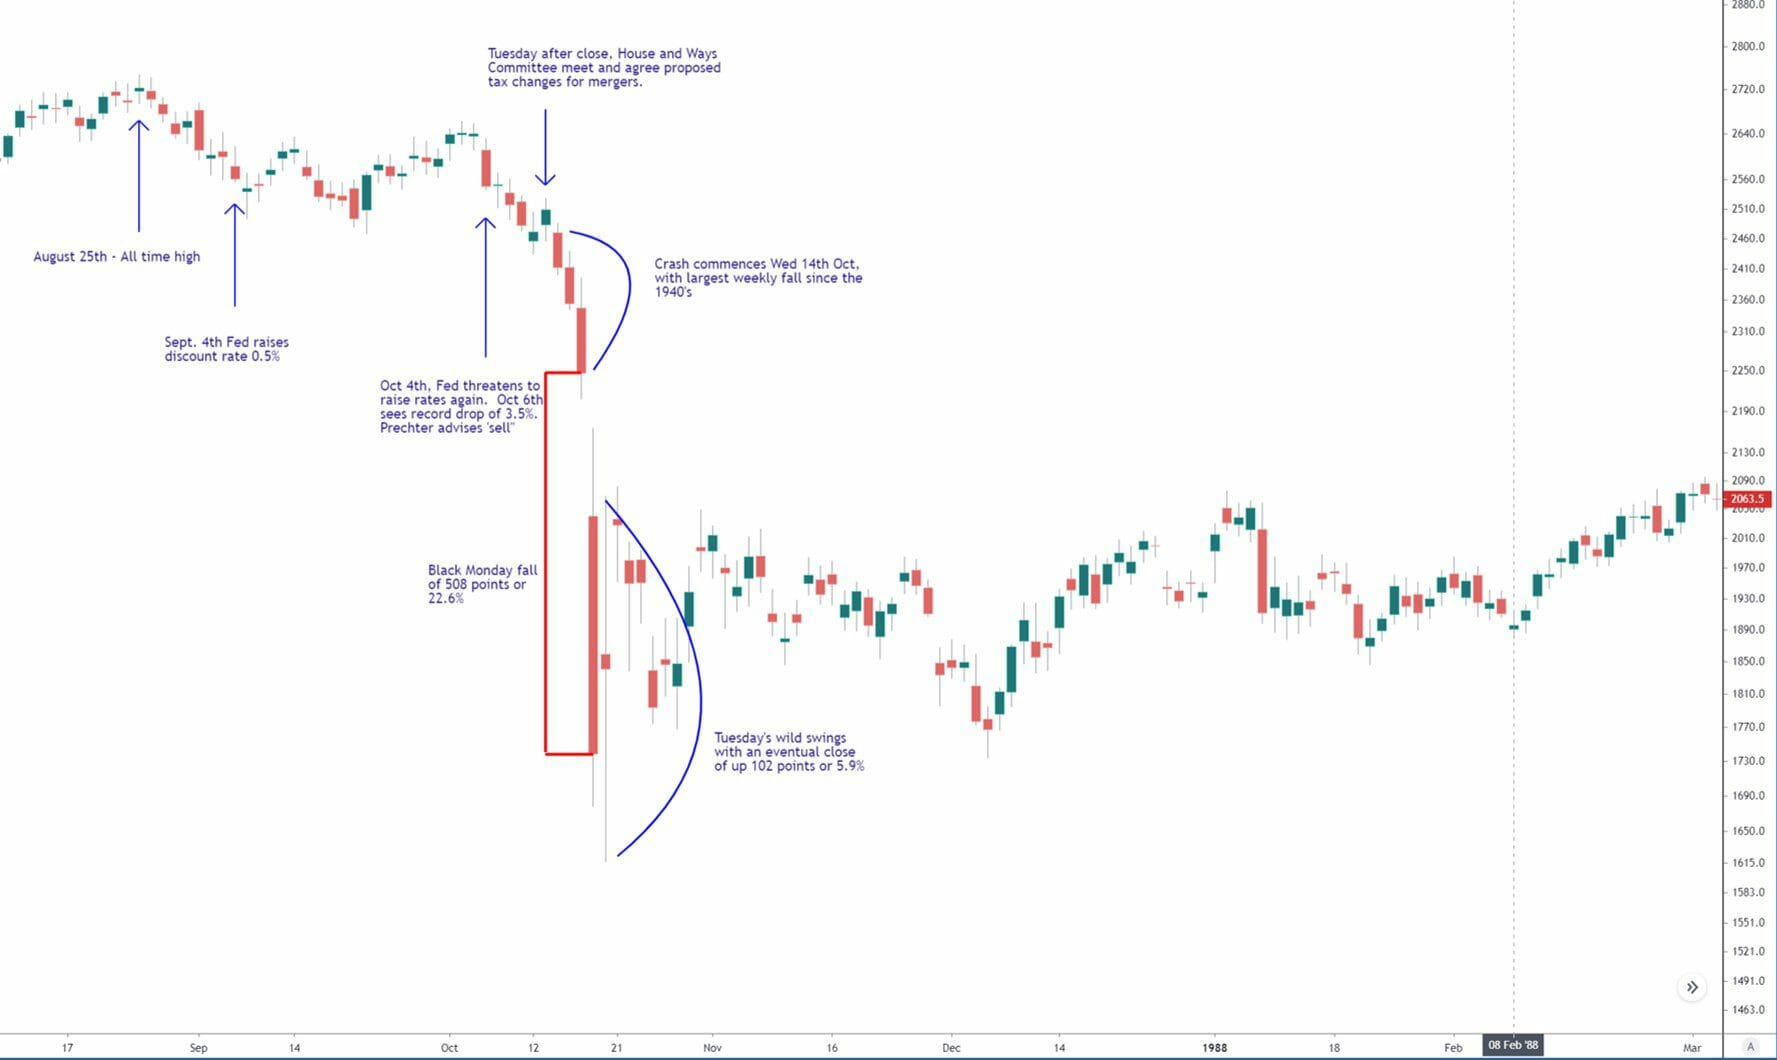 Black Monday in 1987 - Stock Market Crash of 1987 chart - Stock market crash history